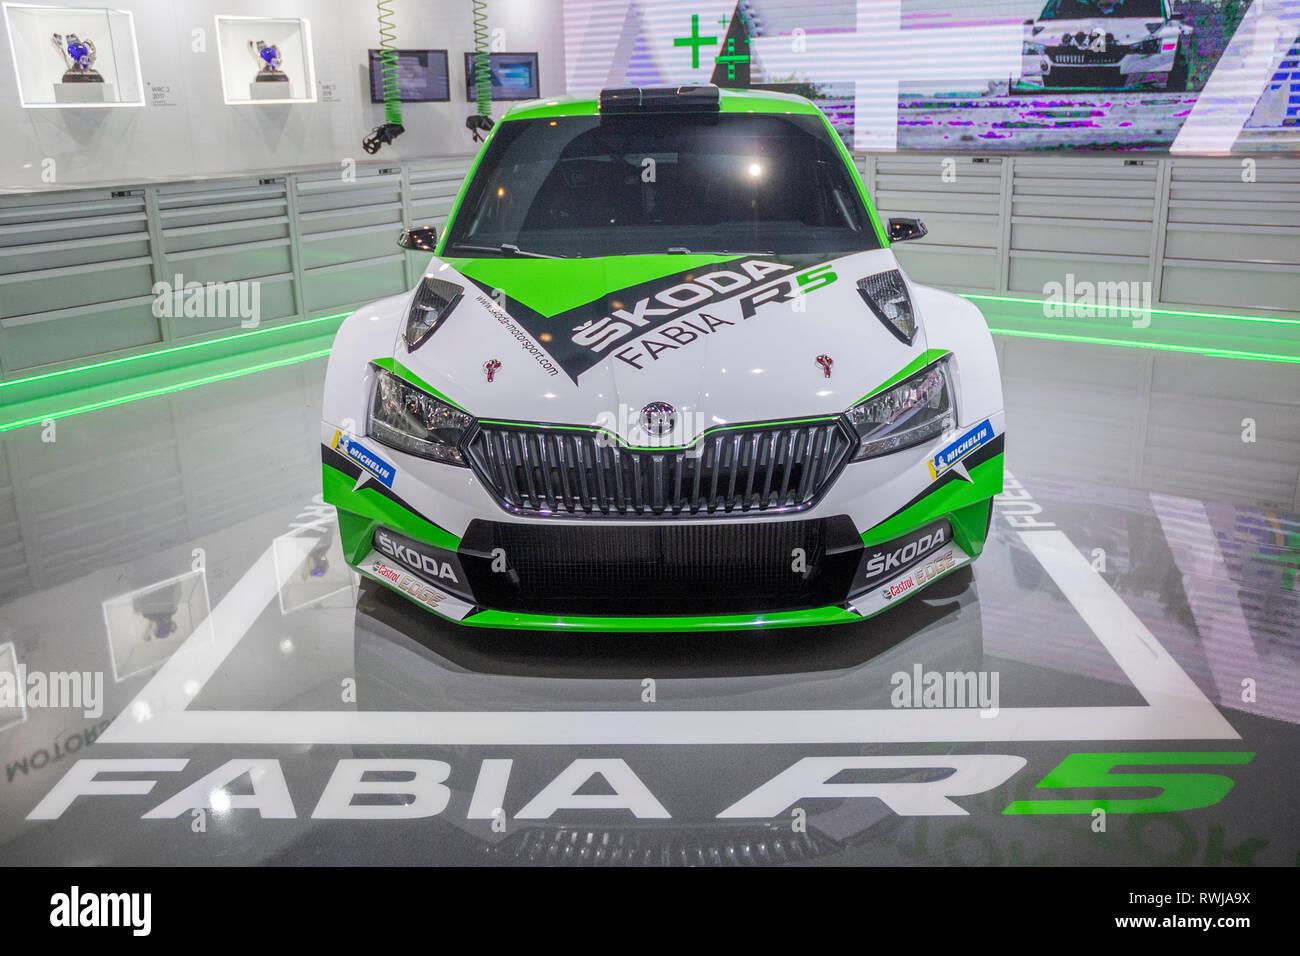 Rally Motor Credit >> Geneva Switzerland 6th March 2019 The New Skodia Fabia